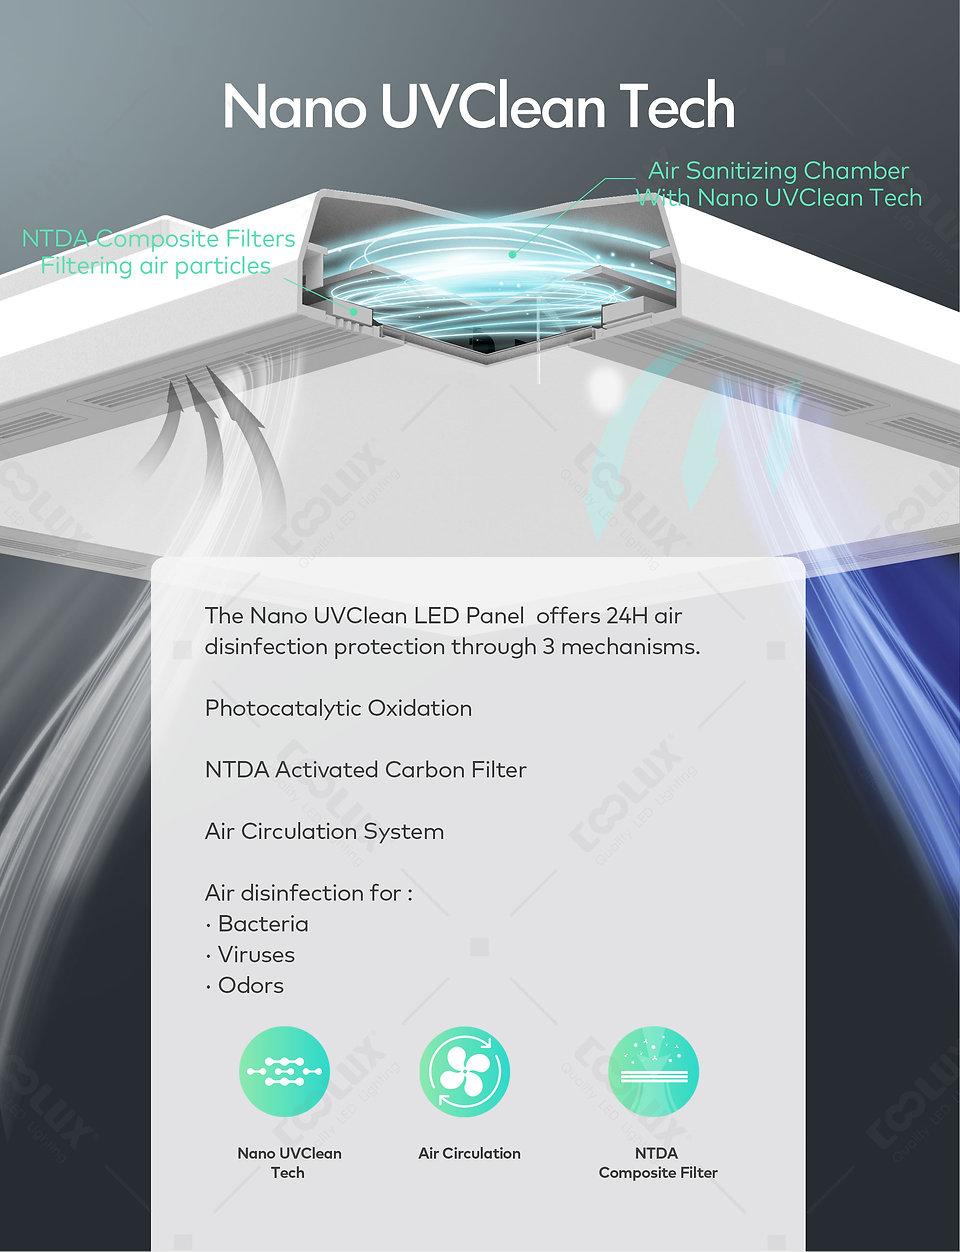 Nano-UVClean-Panel--200909-V6_03.jpg